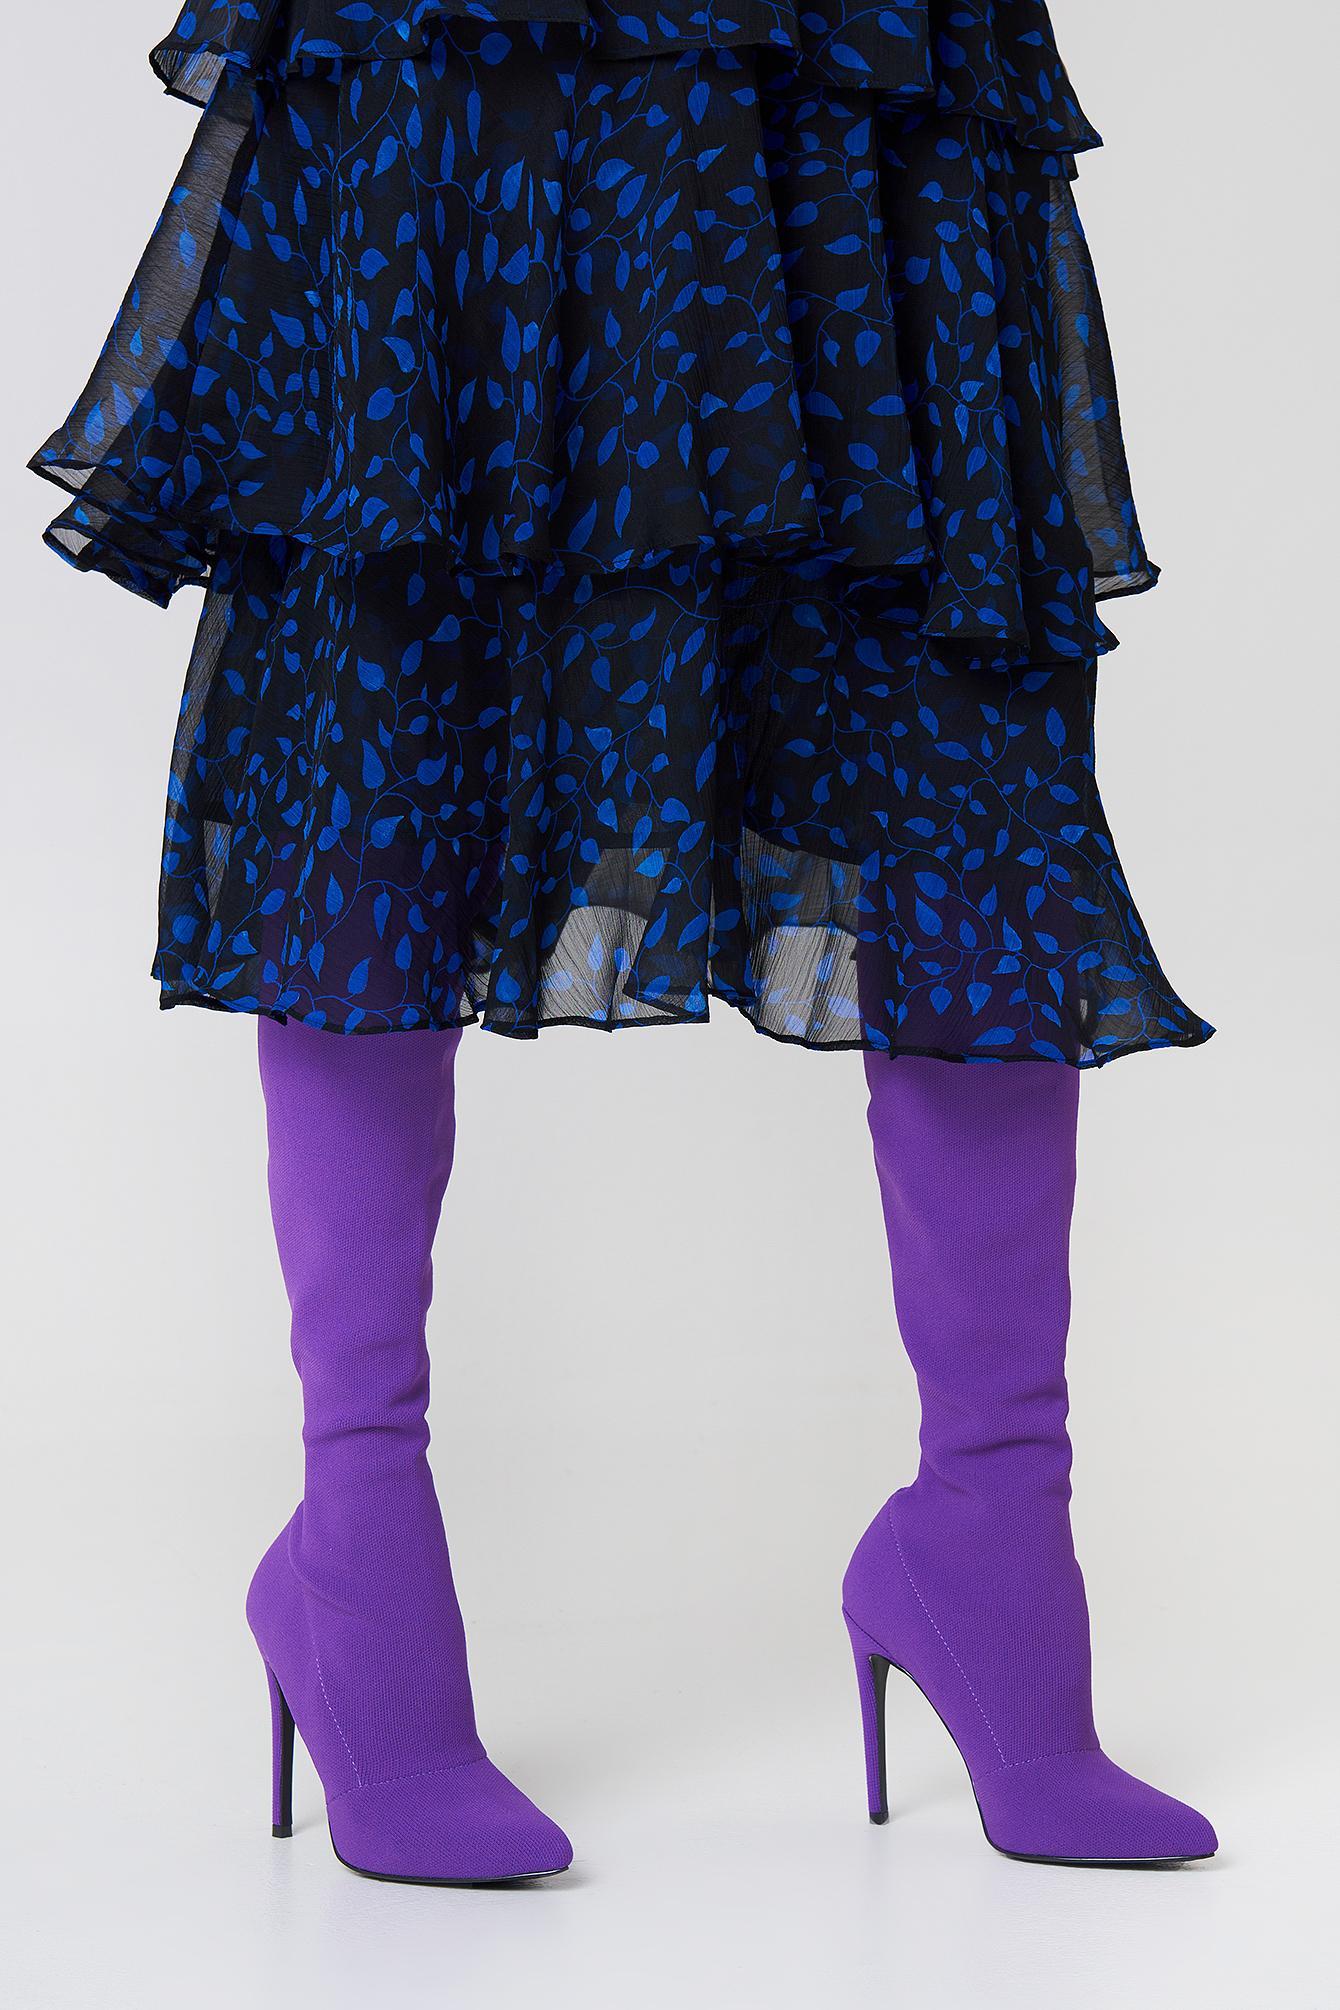 514bee40314 Steve Madden Slammin Boot - Purple